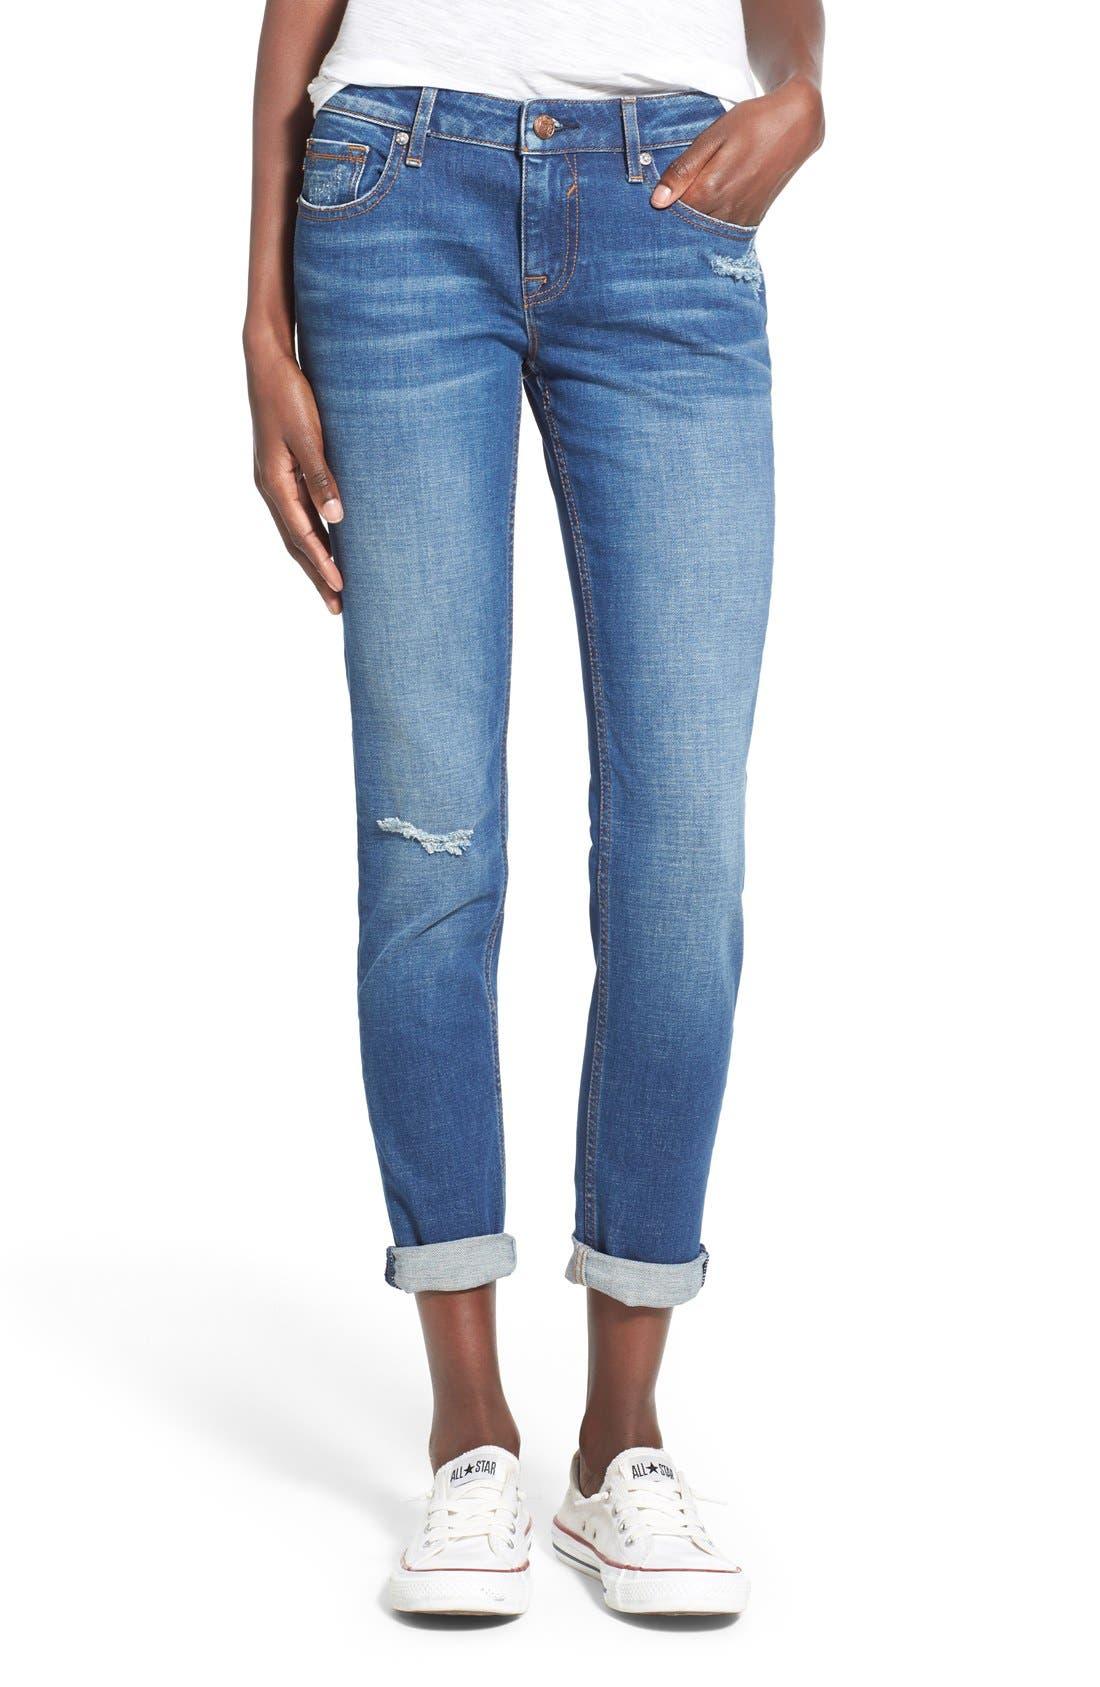 Alternate Image 1 Selected - Vigoss 'Tomboy Thompson' Destructed Jeans (Medium Wash)